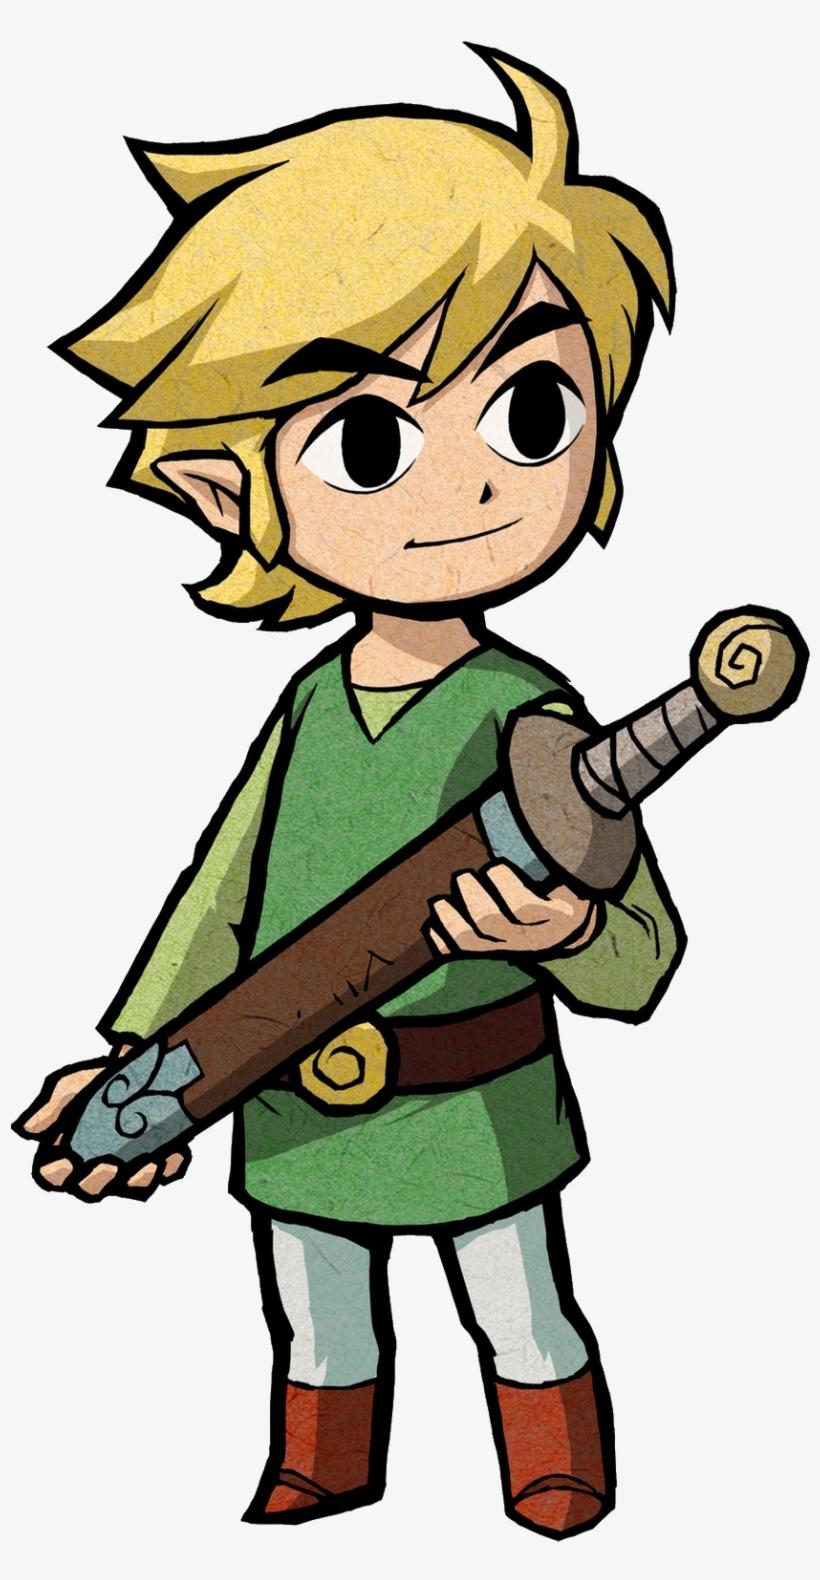 Zelda Link Png Picture.